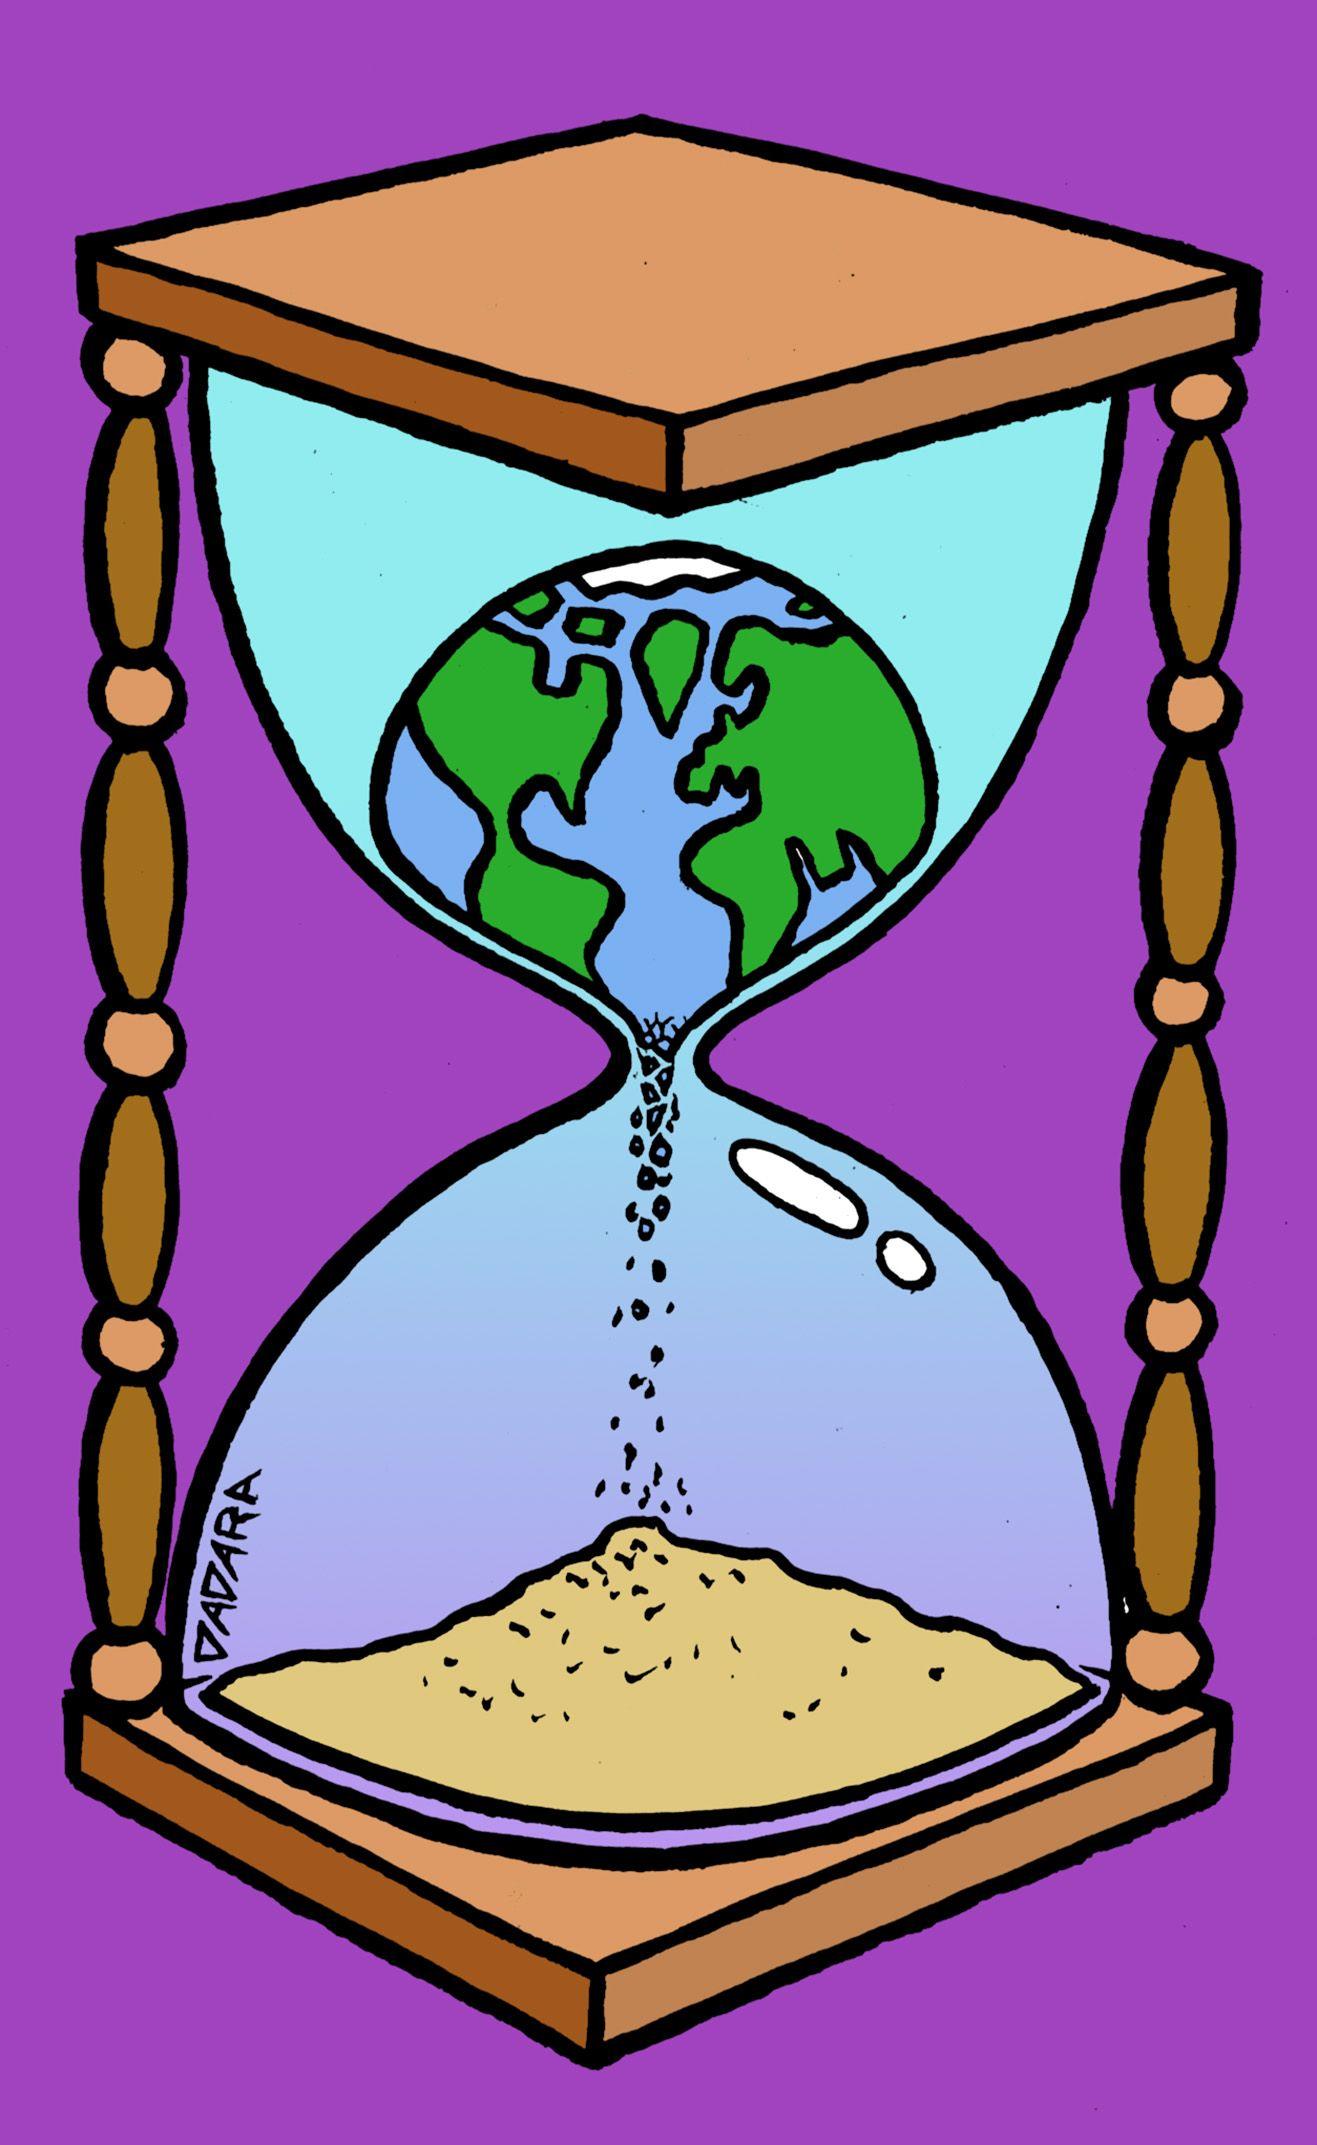 De mensen achter Mysteryland, Hemeltje Lief, Infaders, Magneet Festival, Strawberry Earth,  Live Build, Wasted, Blijburg, Green Events, 10,000 HOURS, Alter Ego, Shoeless, Open-House, Pelican House, UMEF, Solar Weekend, Ninjin, Nachtkristal, School of House. Groen Innovaties, Karma Kollectiv, Dadara, Beyond, Nepco, Love Caterpillar en Pretvormers gaan mee dansen in de Klimaatparade 29 november 2015